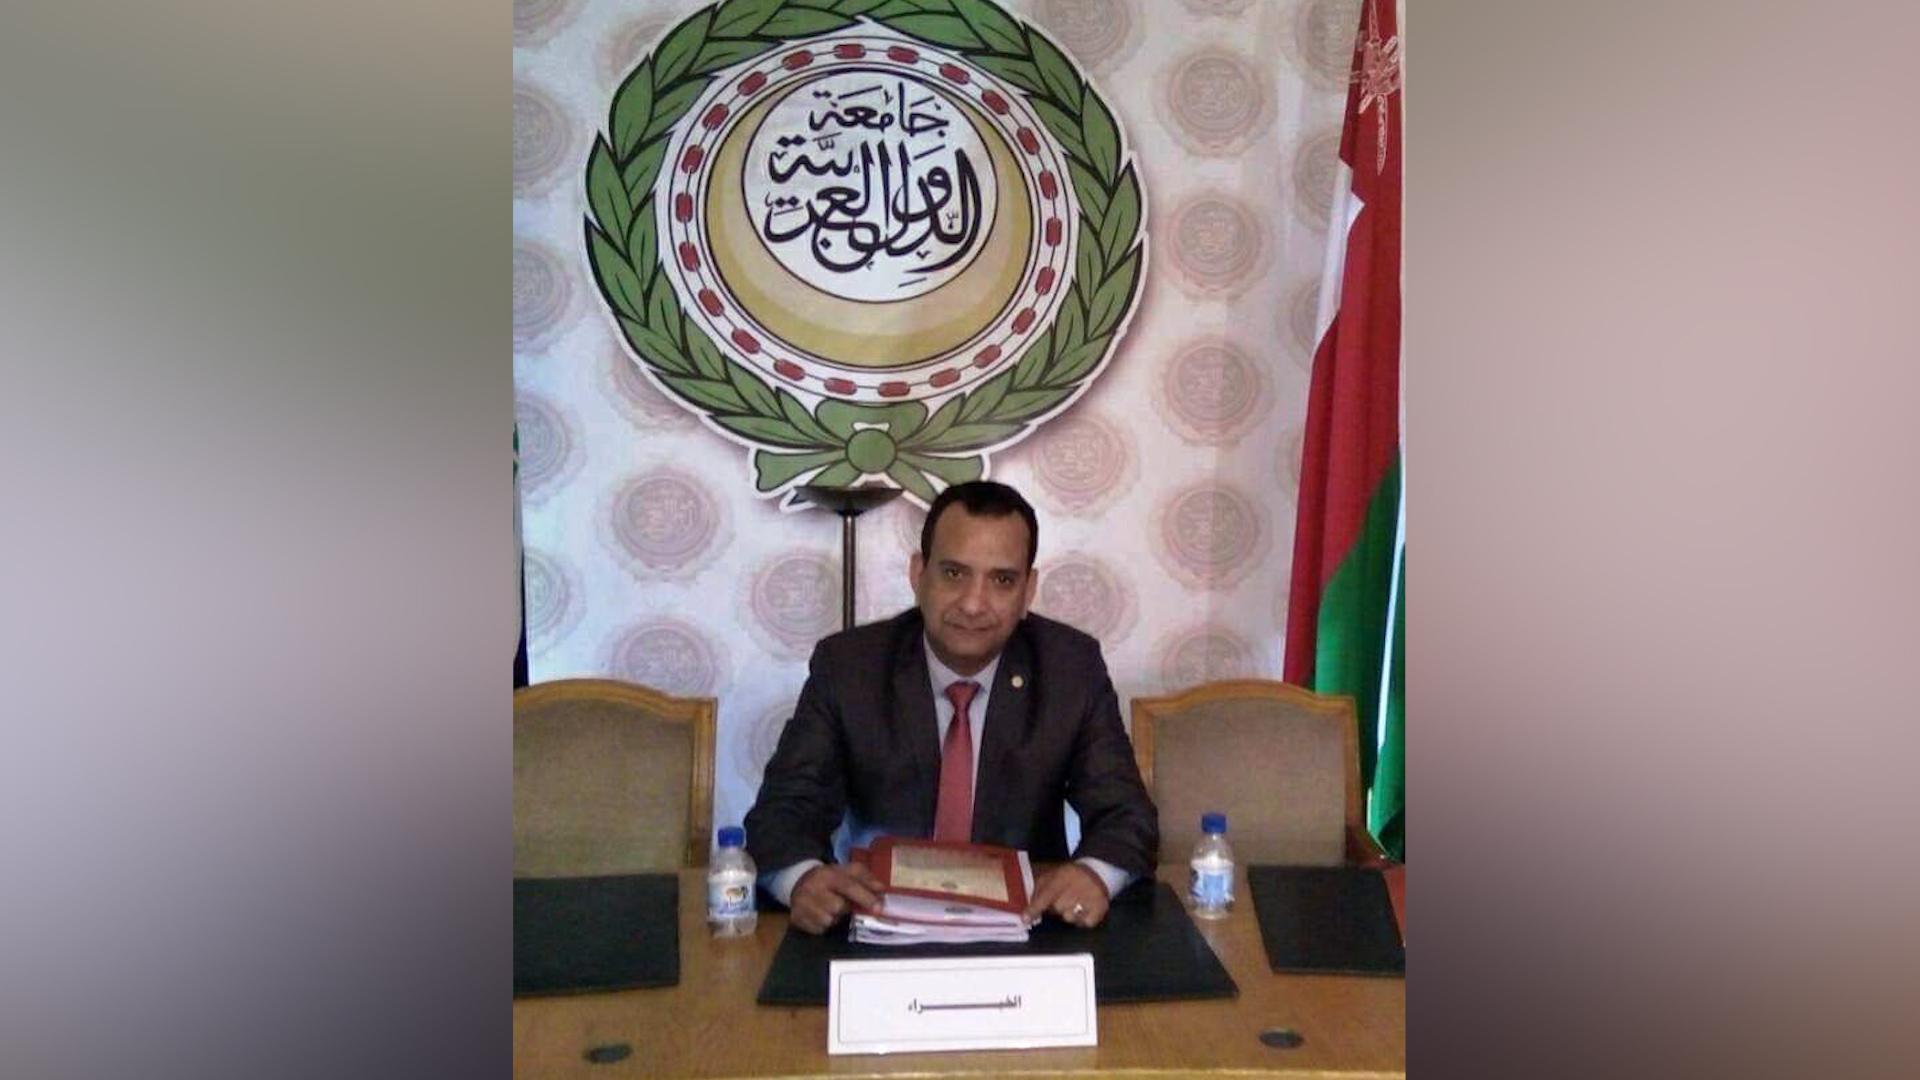 Photo of إعلامي مصري: تركيا تتحرك لدعم التيار الإخواني أينما وجد